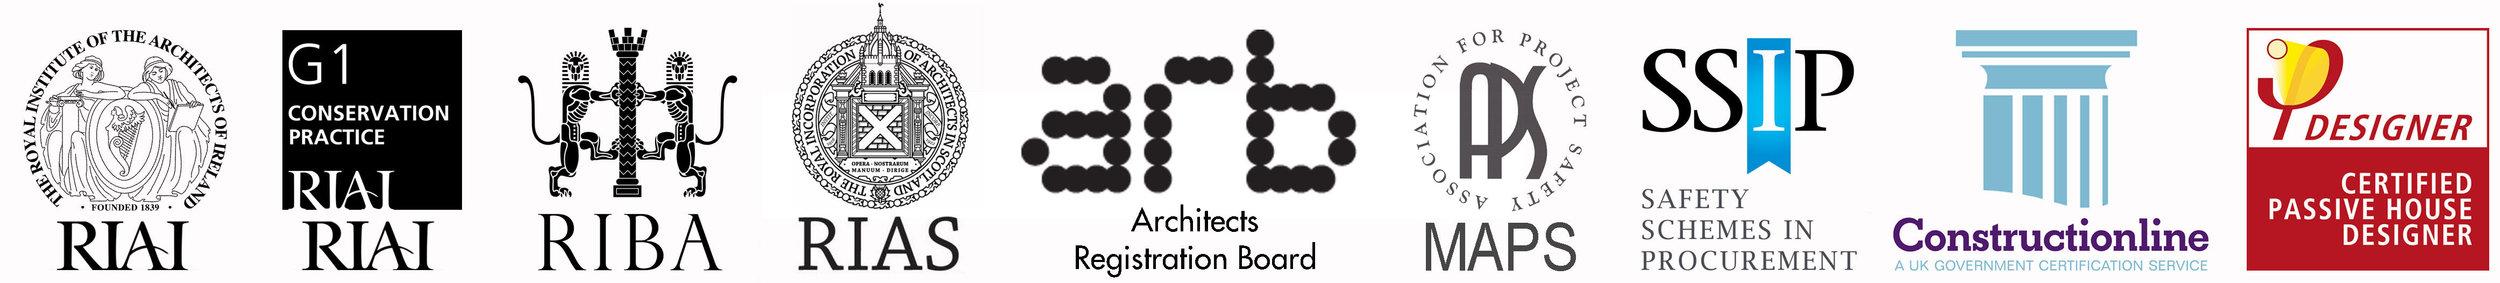 LOGOS-web-accreditations-mpa.jpg